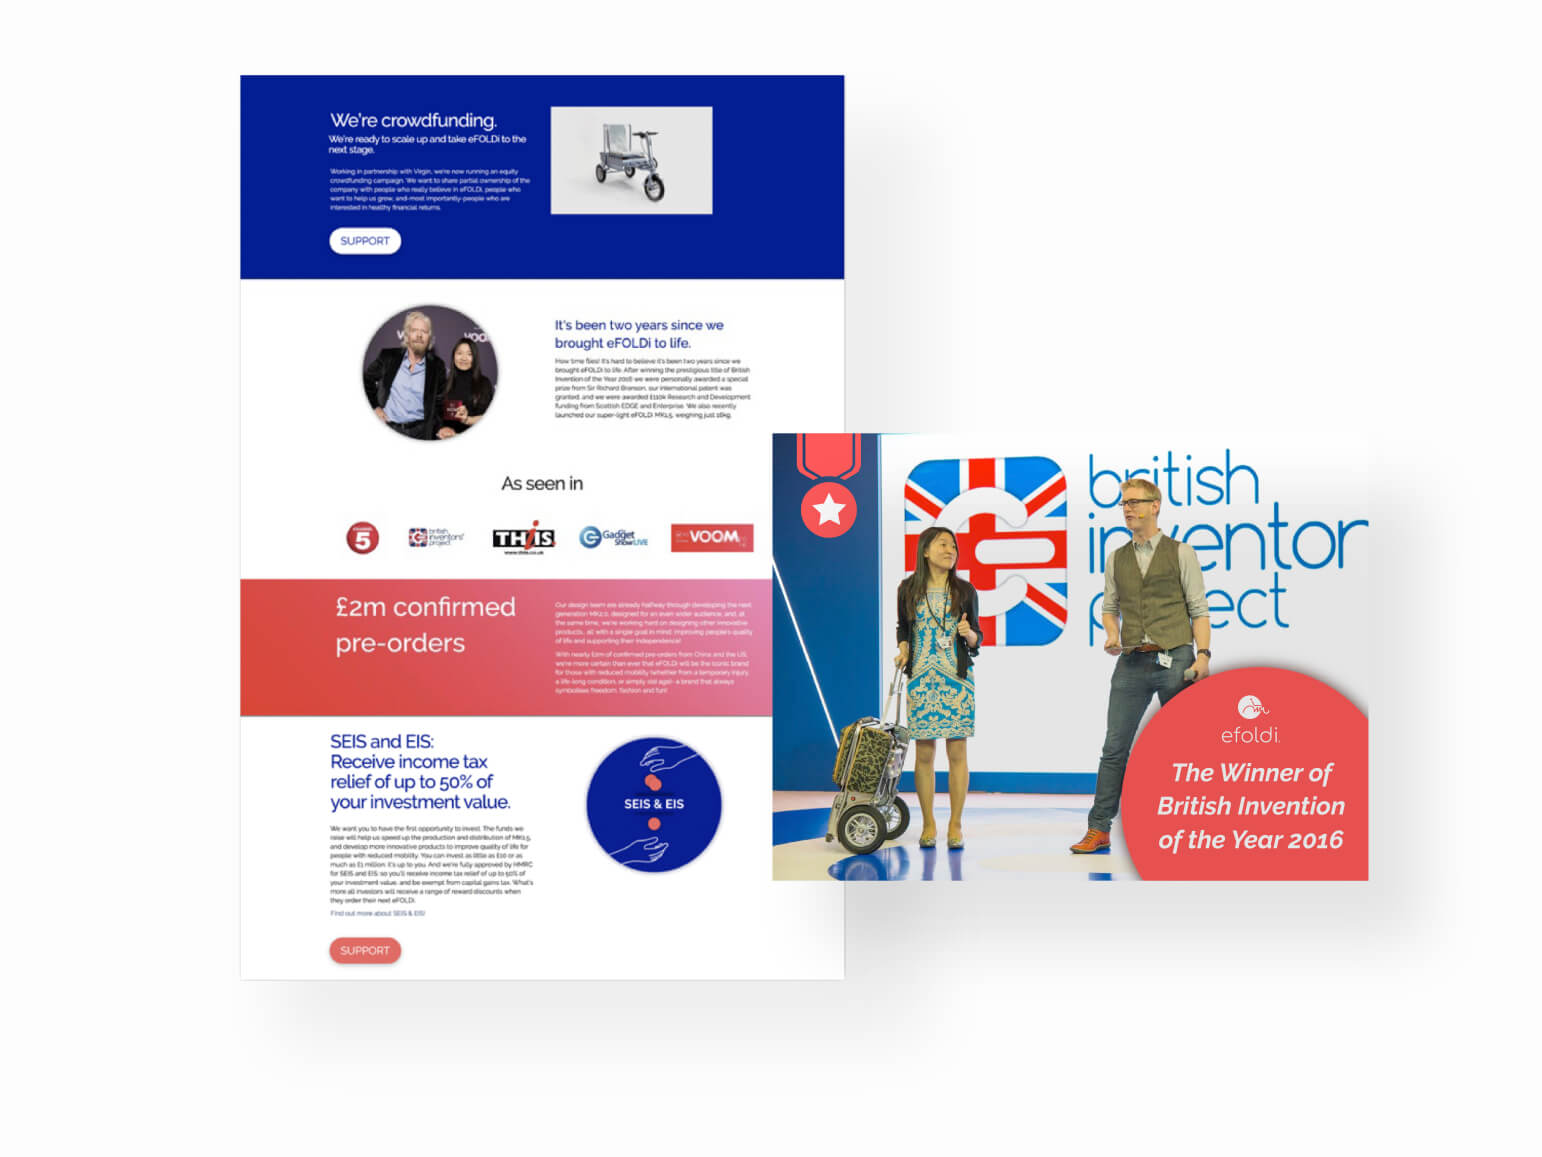 Serkan_Ferah_Branding_Pitching_Design_London_eFoldi-rebranding-crowdfunding-marketing-pitching-pitch-design-05.jpg